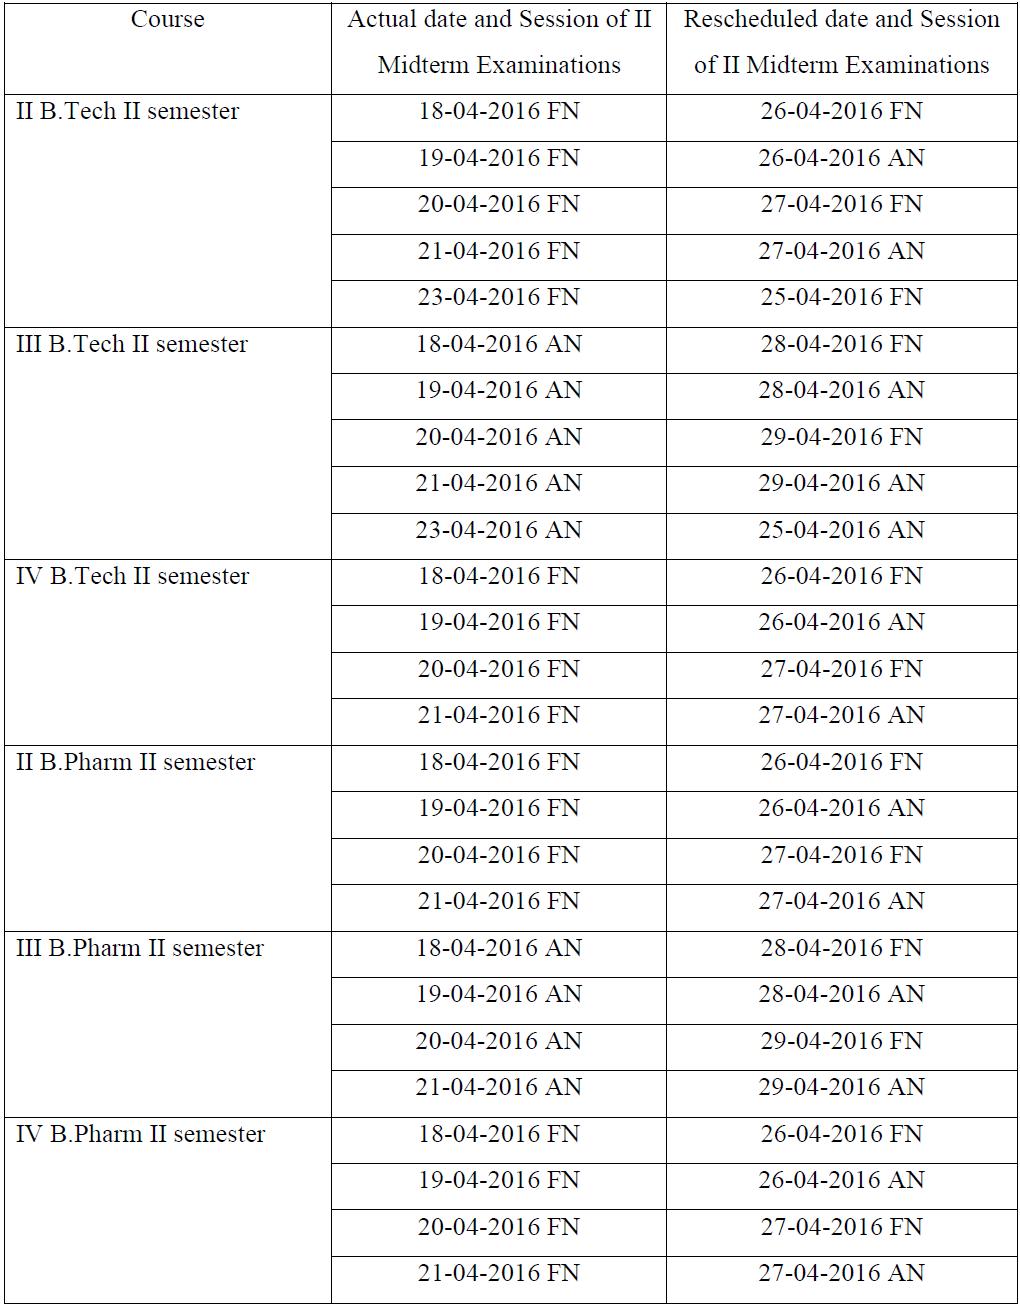 jntuh 2nd mid exam dates